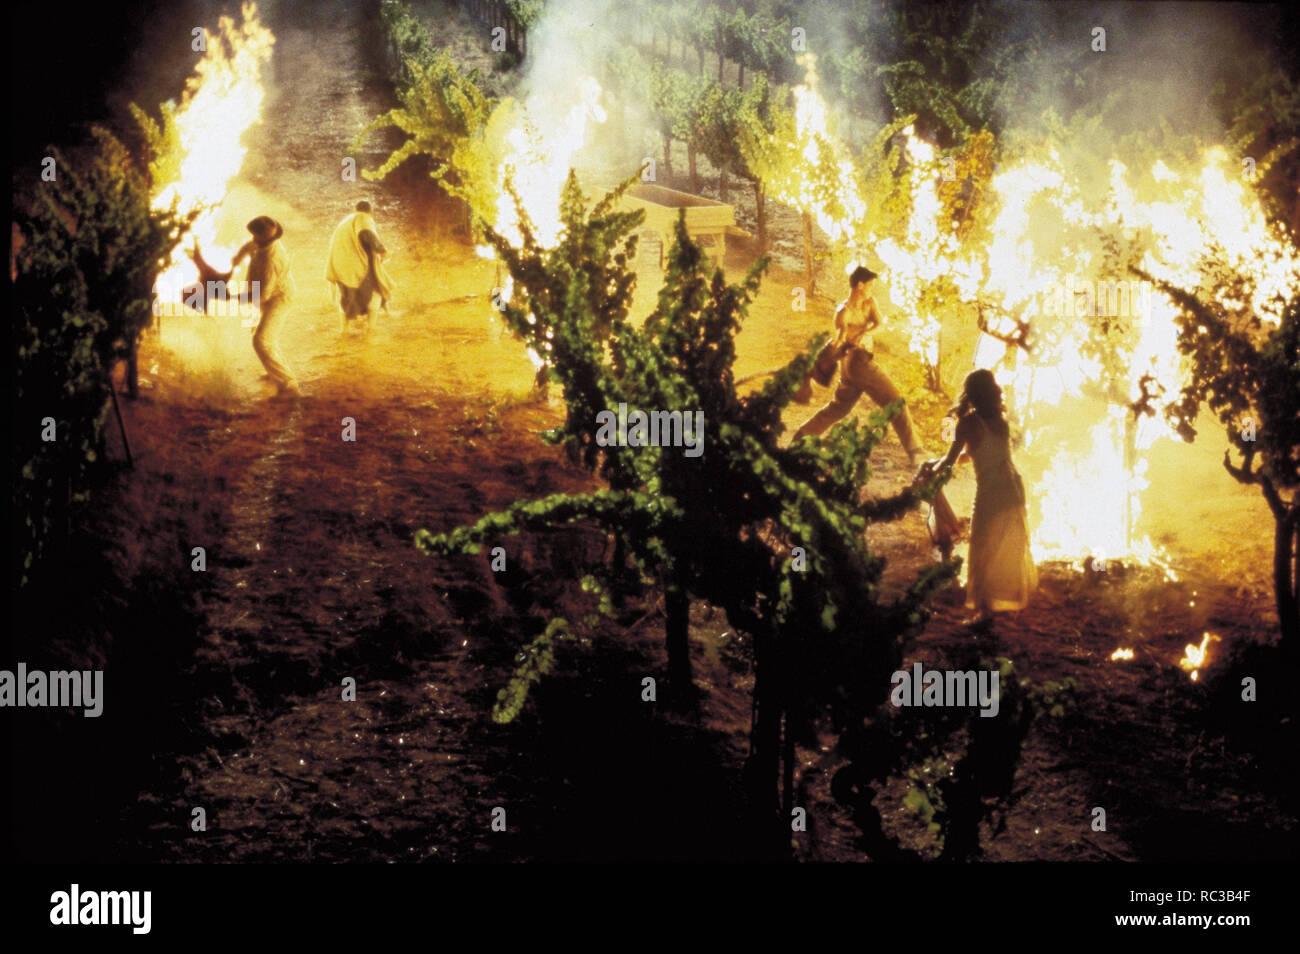 Original film title: A WALK IN THE CLOUDS. English title: A WALK IN THE CLOUDS. Year: 1995. Director: ALFONSO ARAU. Credit: 20TH CENTURY FOX / Album - Stock Image